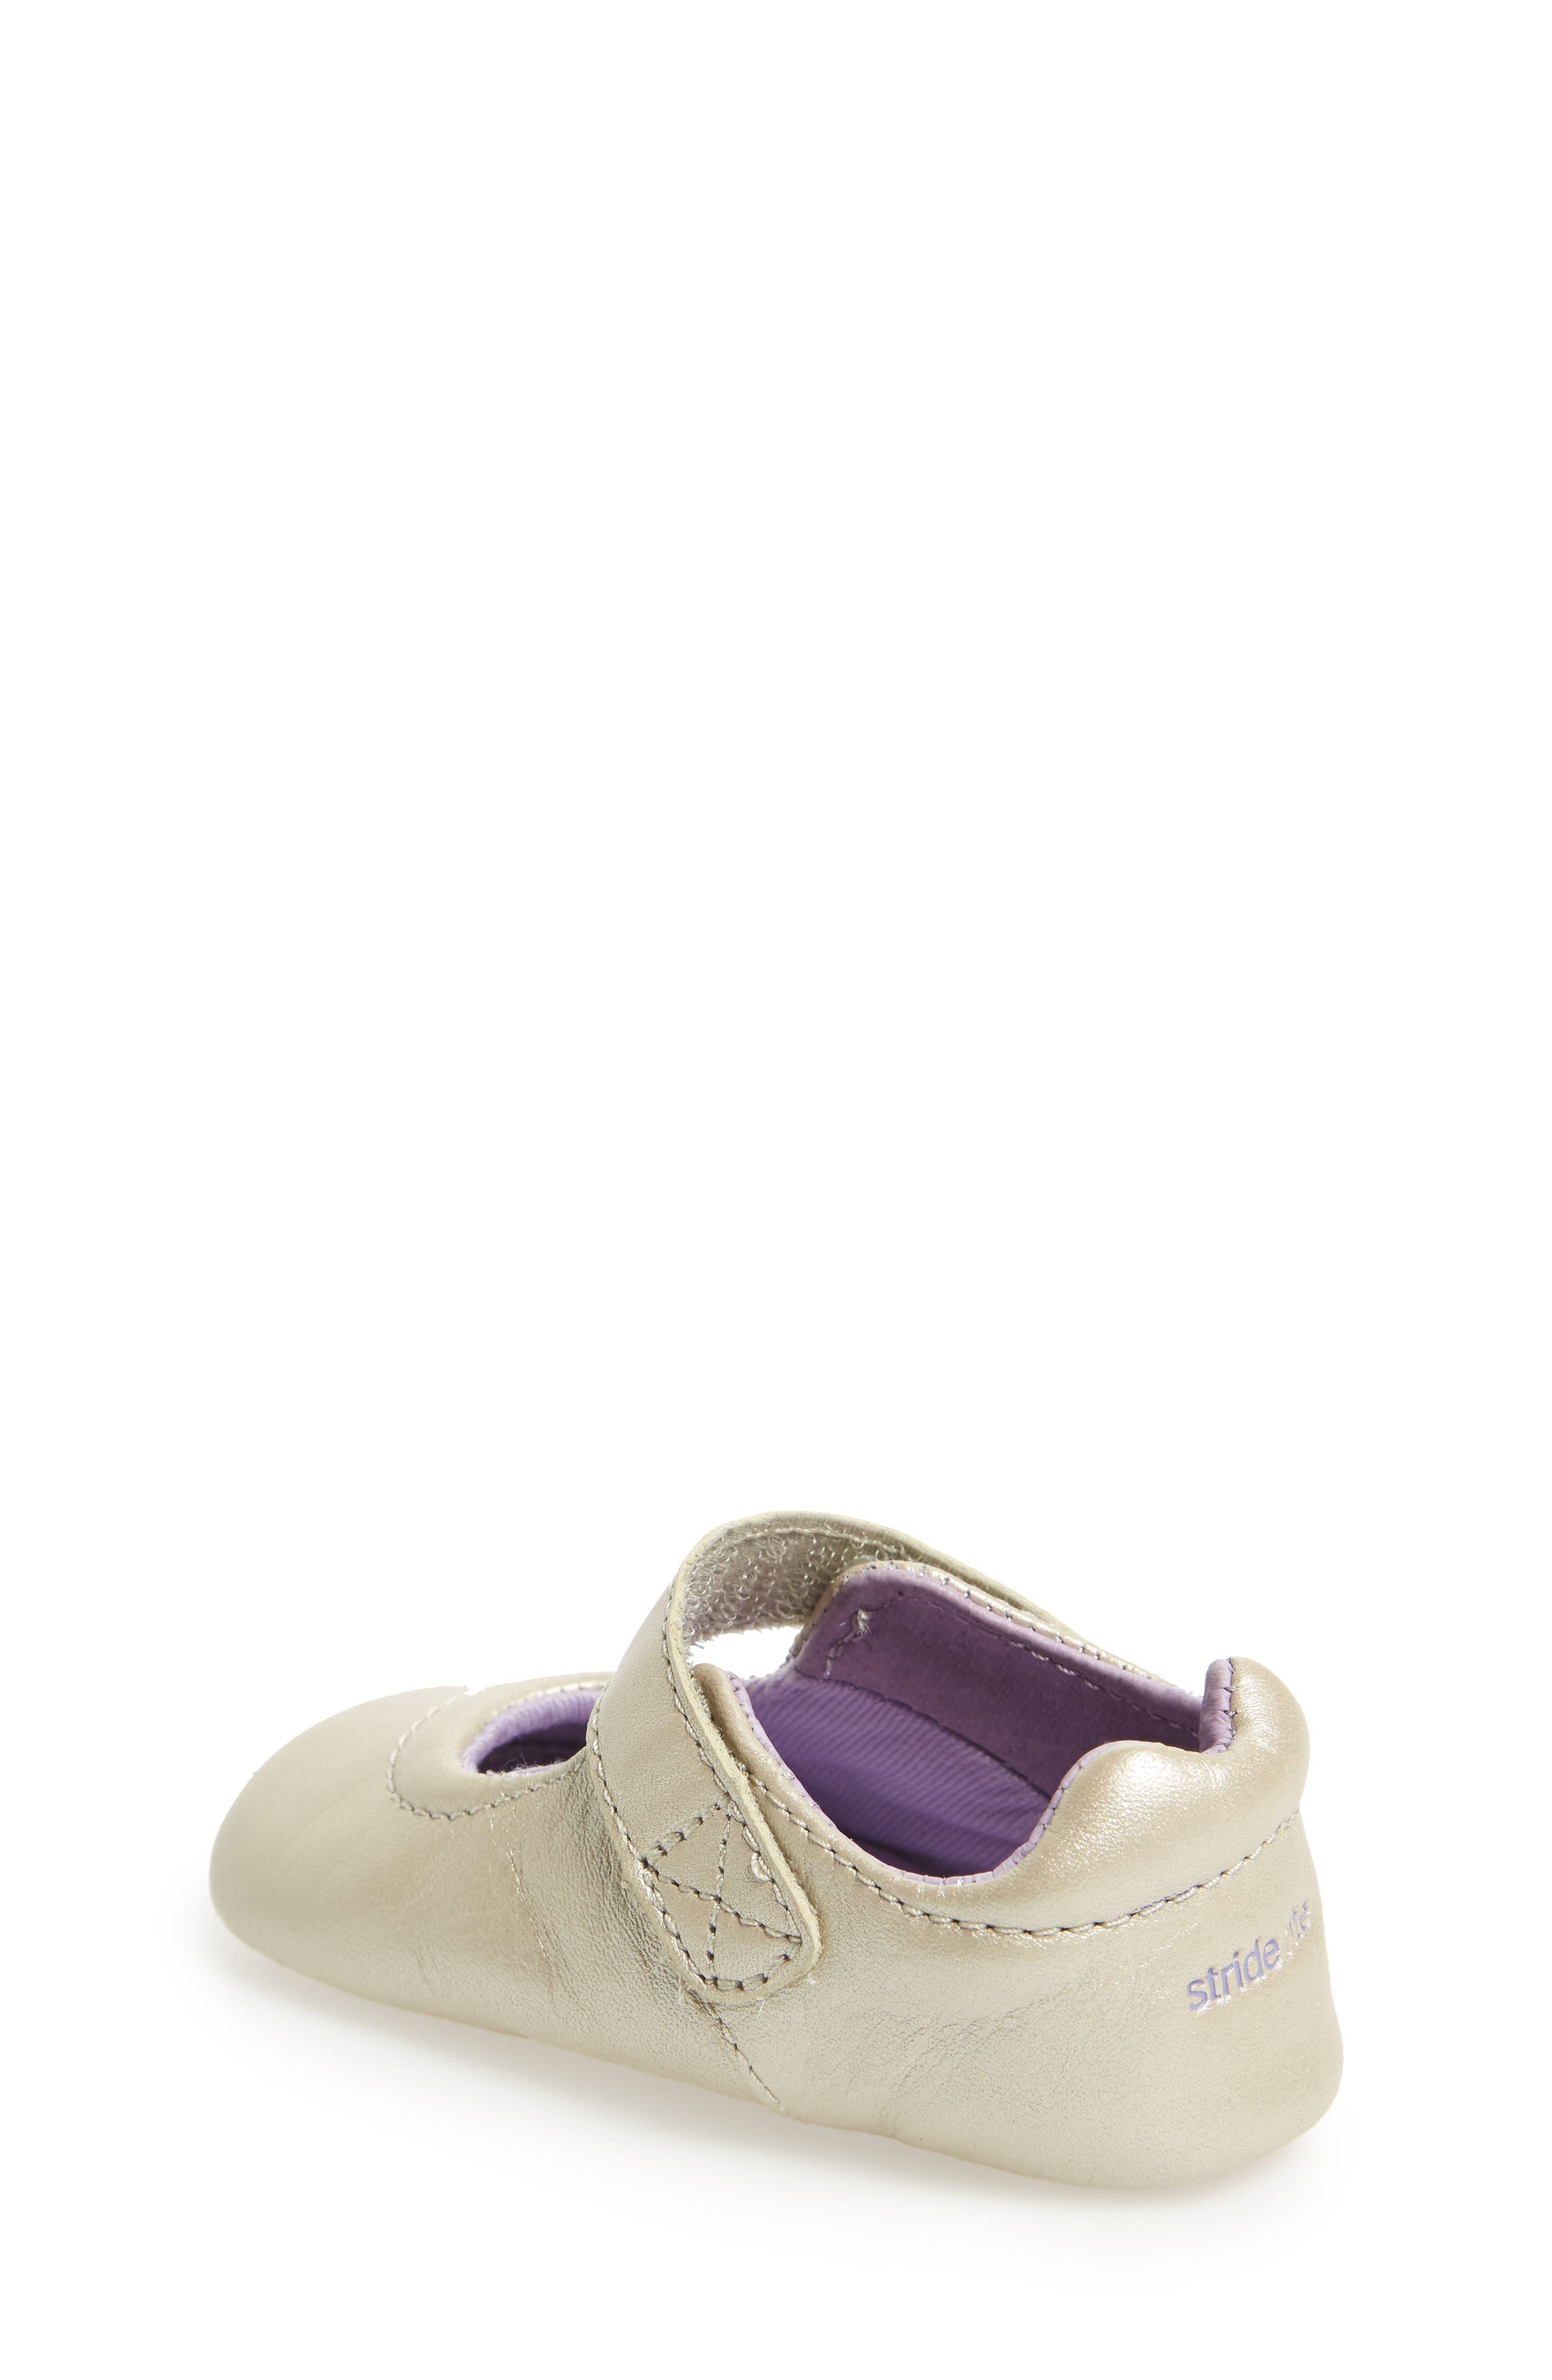 Liza Mary Jane Crib Shoe,                             Alternate thumbnail 2, color,                             Champagne Leather